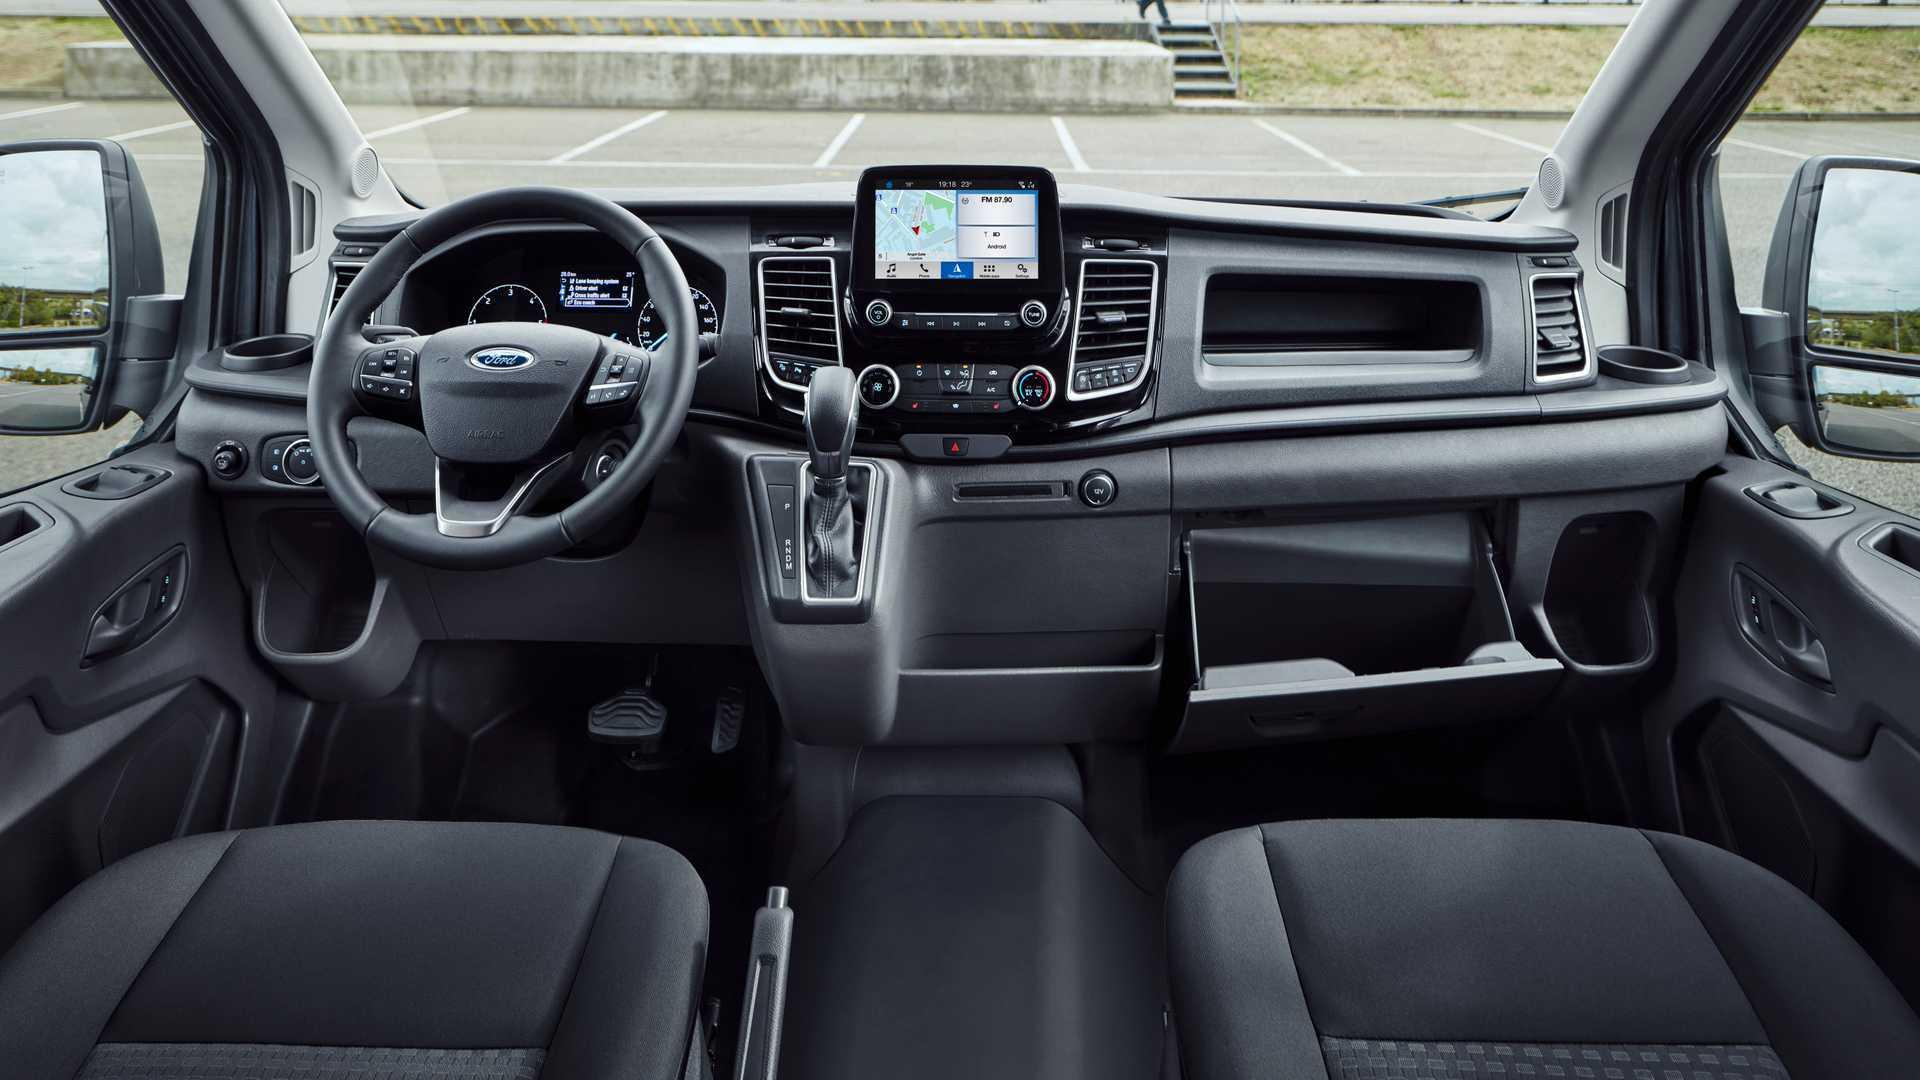 Ford Transit 2020 Alles Zur Neuen Generation Des Transporters